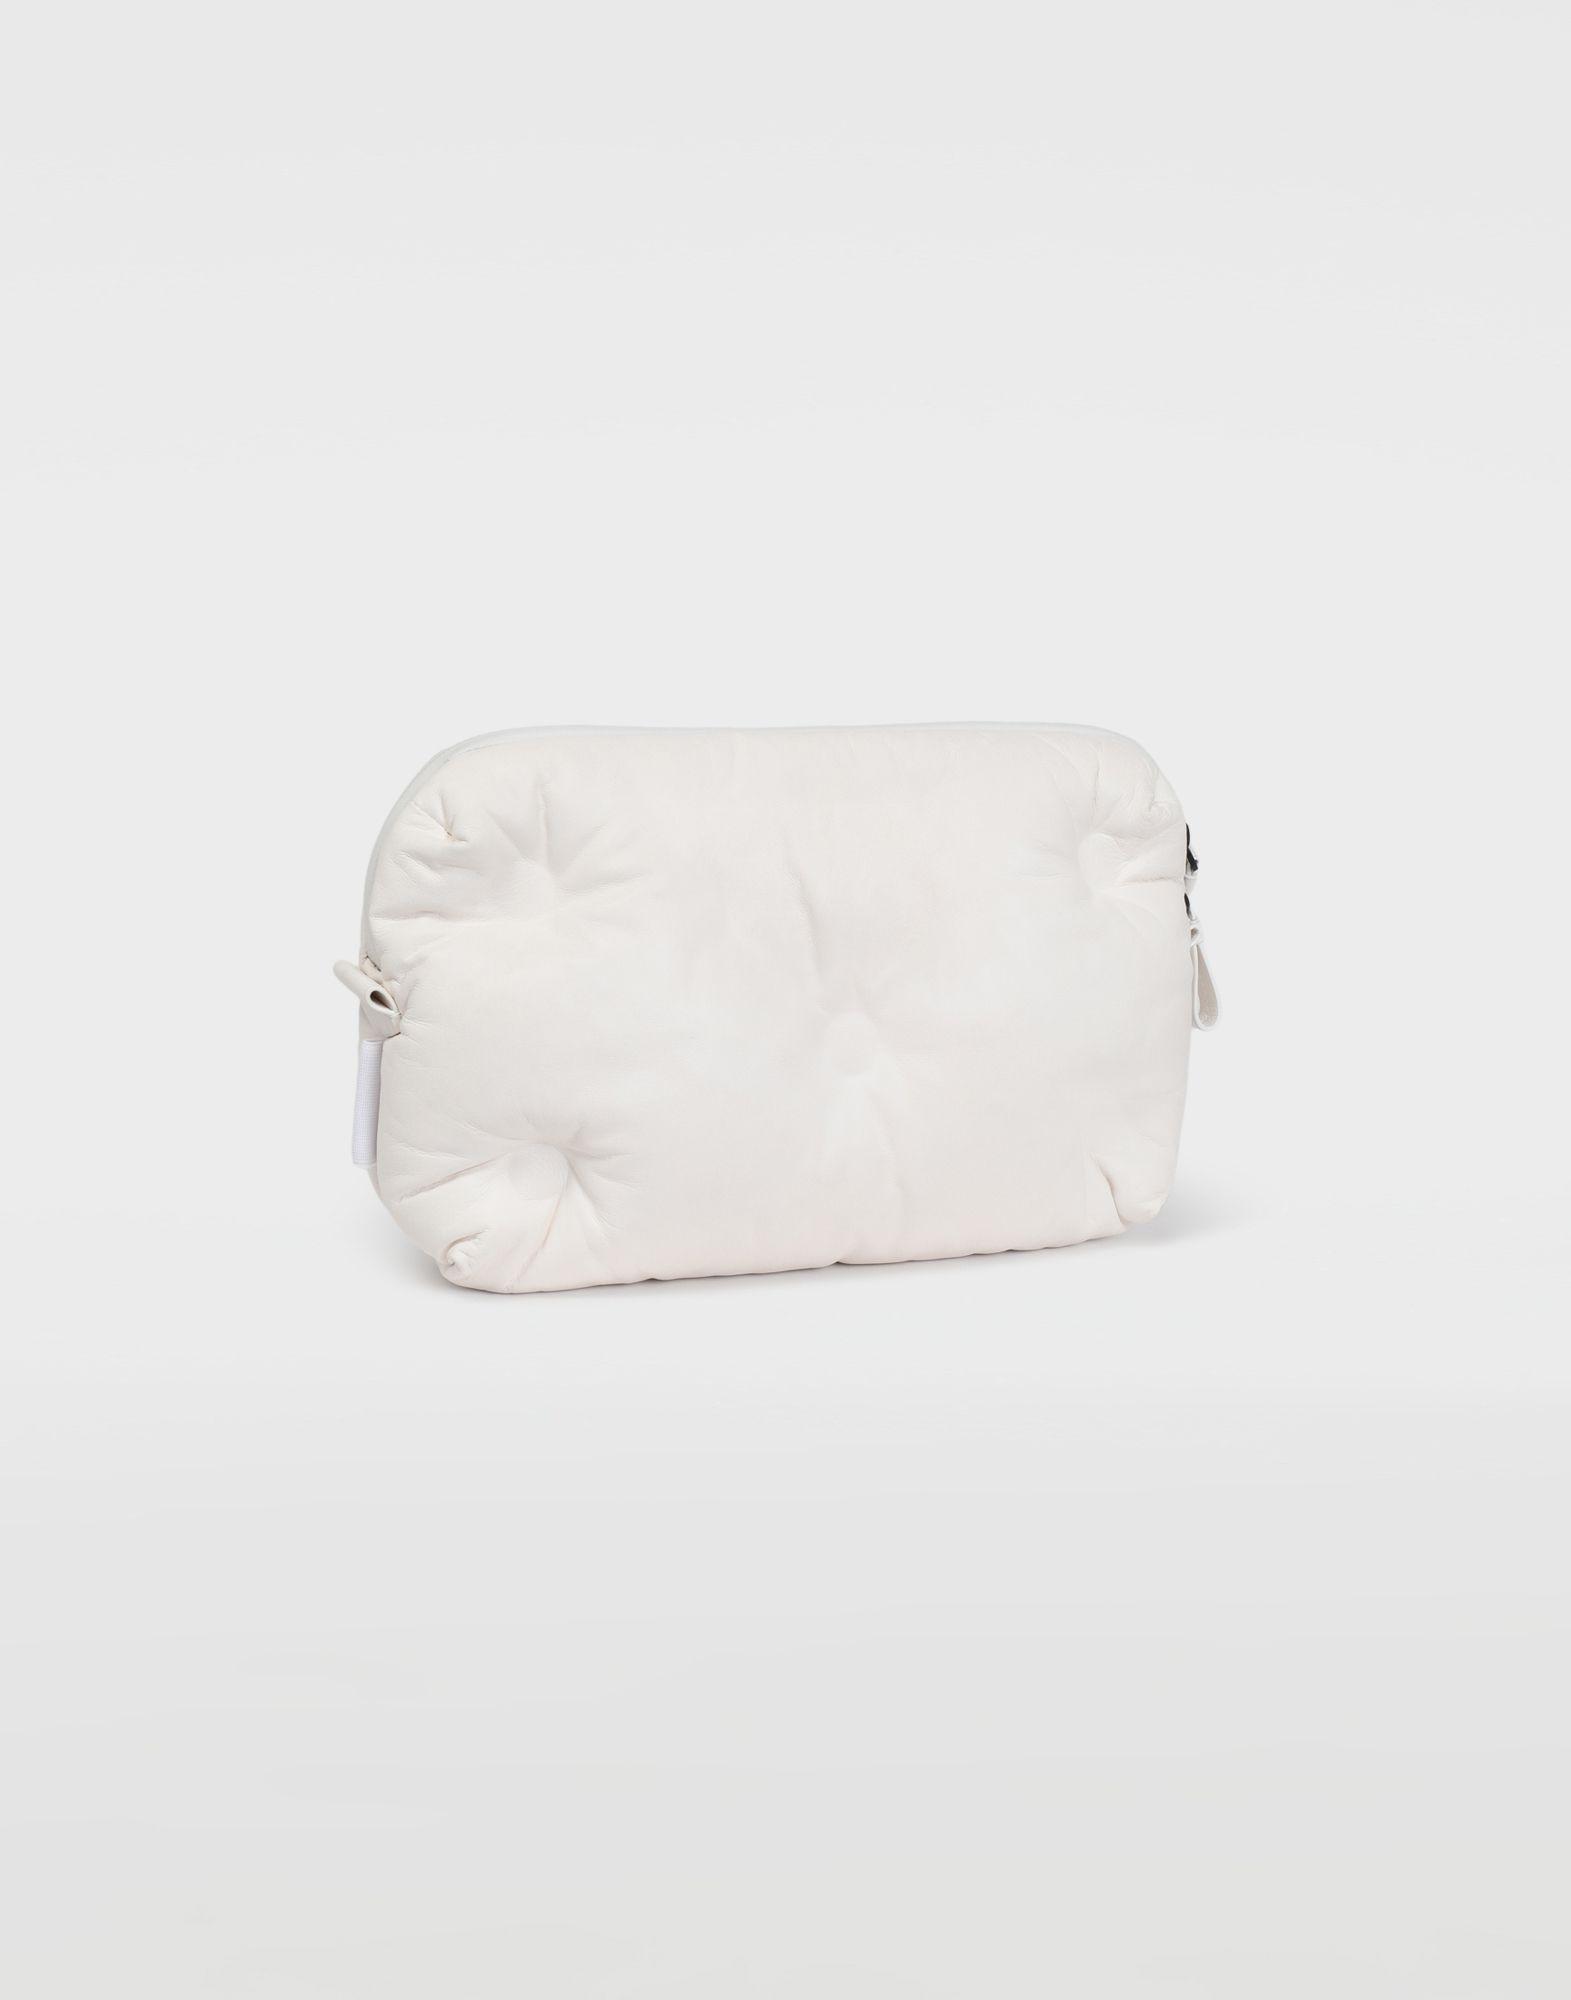 MAISON MARGIELA Glam Slam leather crossbody Fanny pack Man r